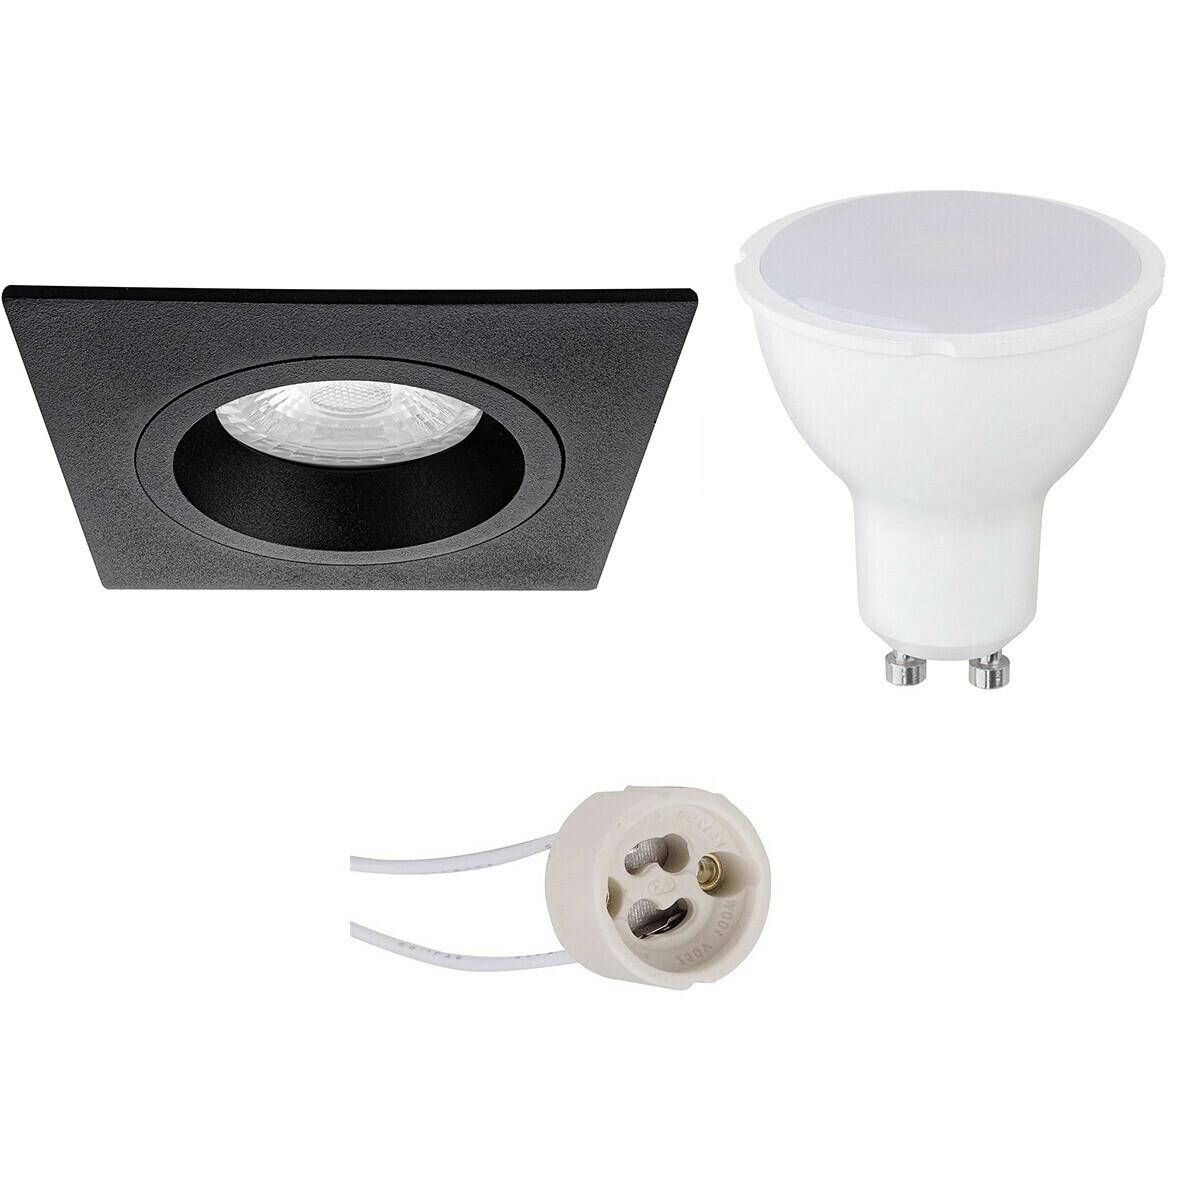 LED Spot Set - Pragmi Rodos Pro - GU10 Fitting - Inbouw Vierkant - Mat Zwart - 4W - Warm Wit 3000K -